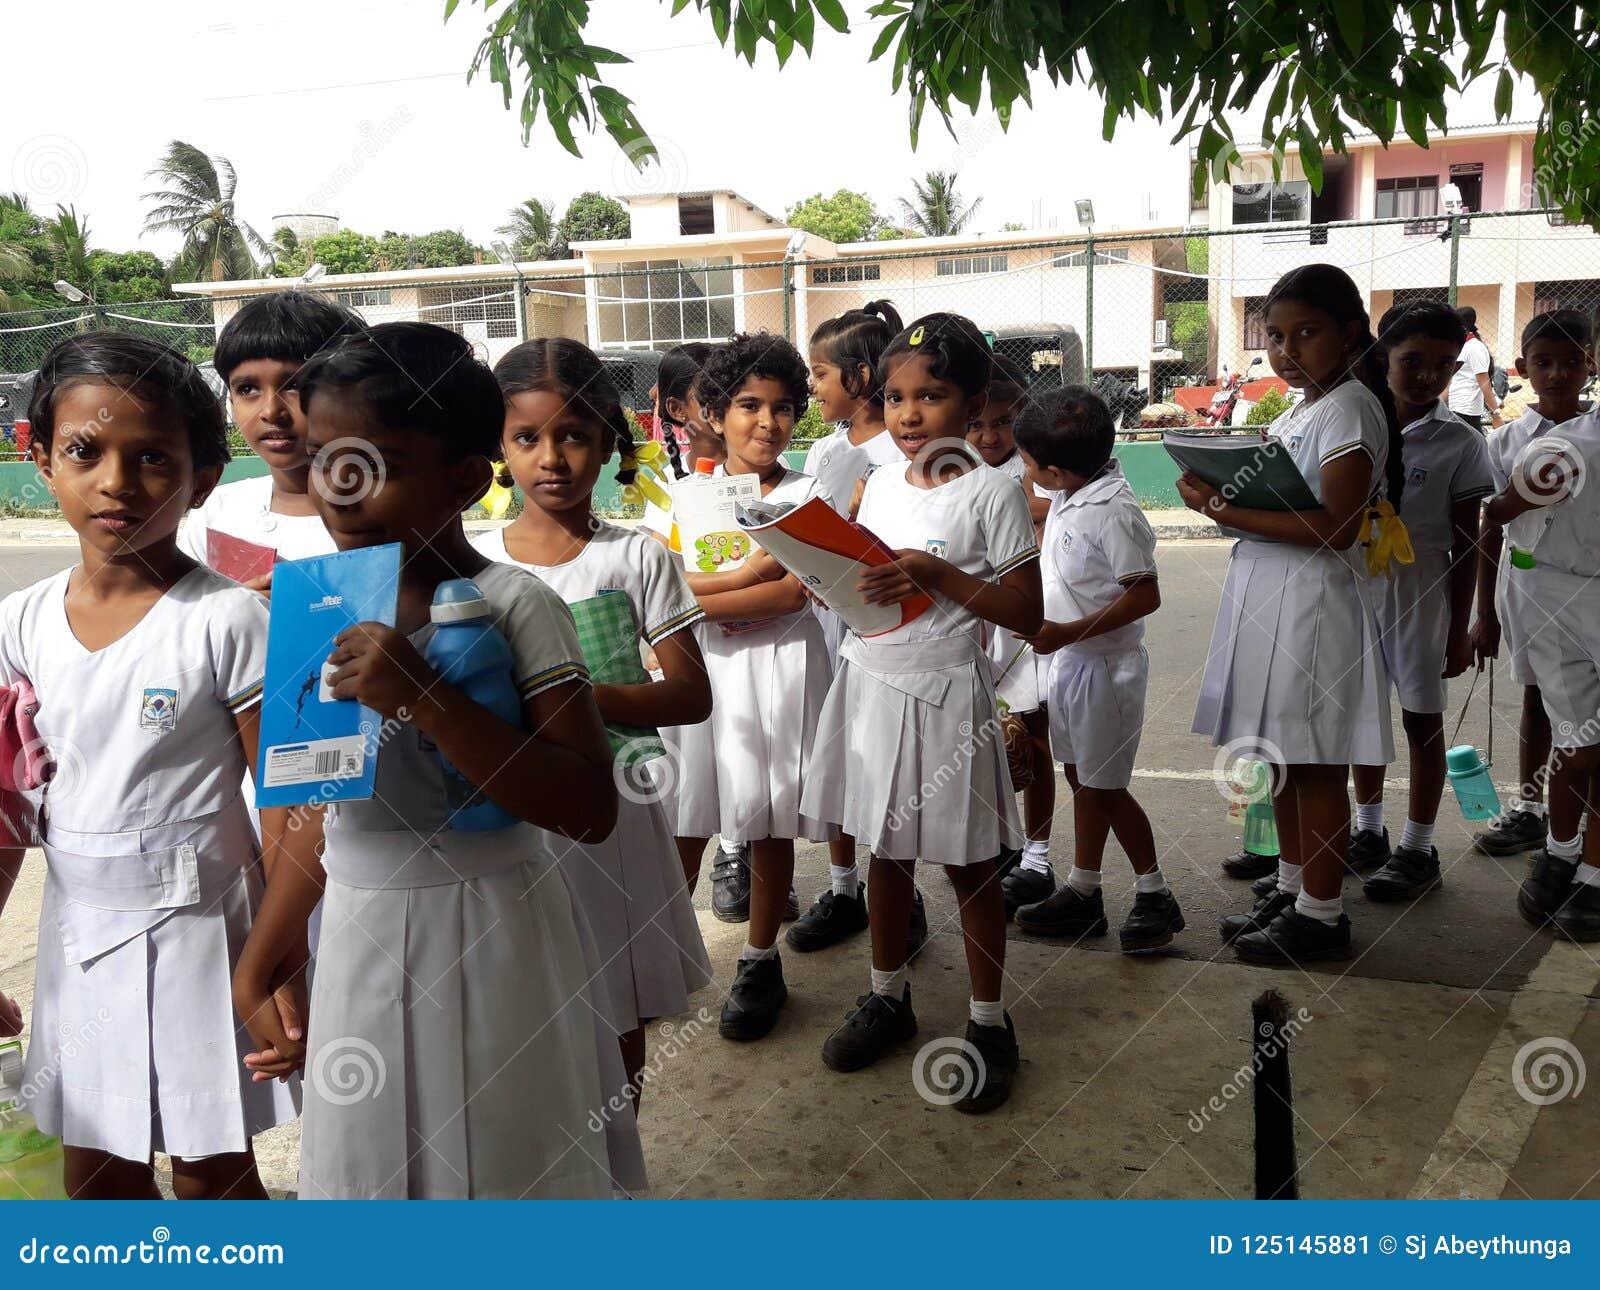 Srilankan School Students